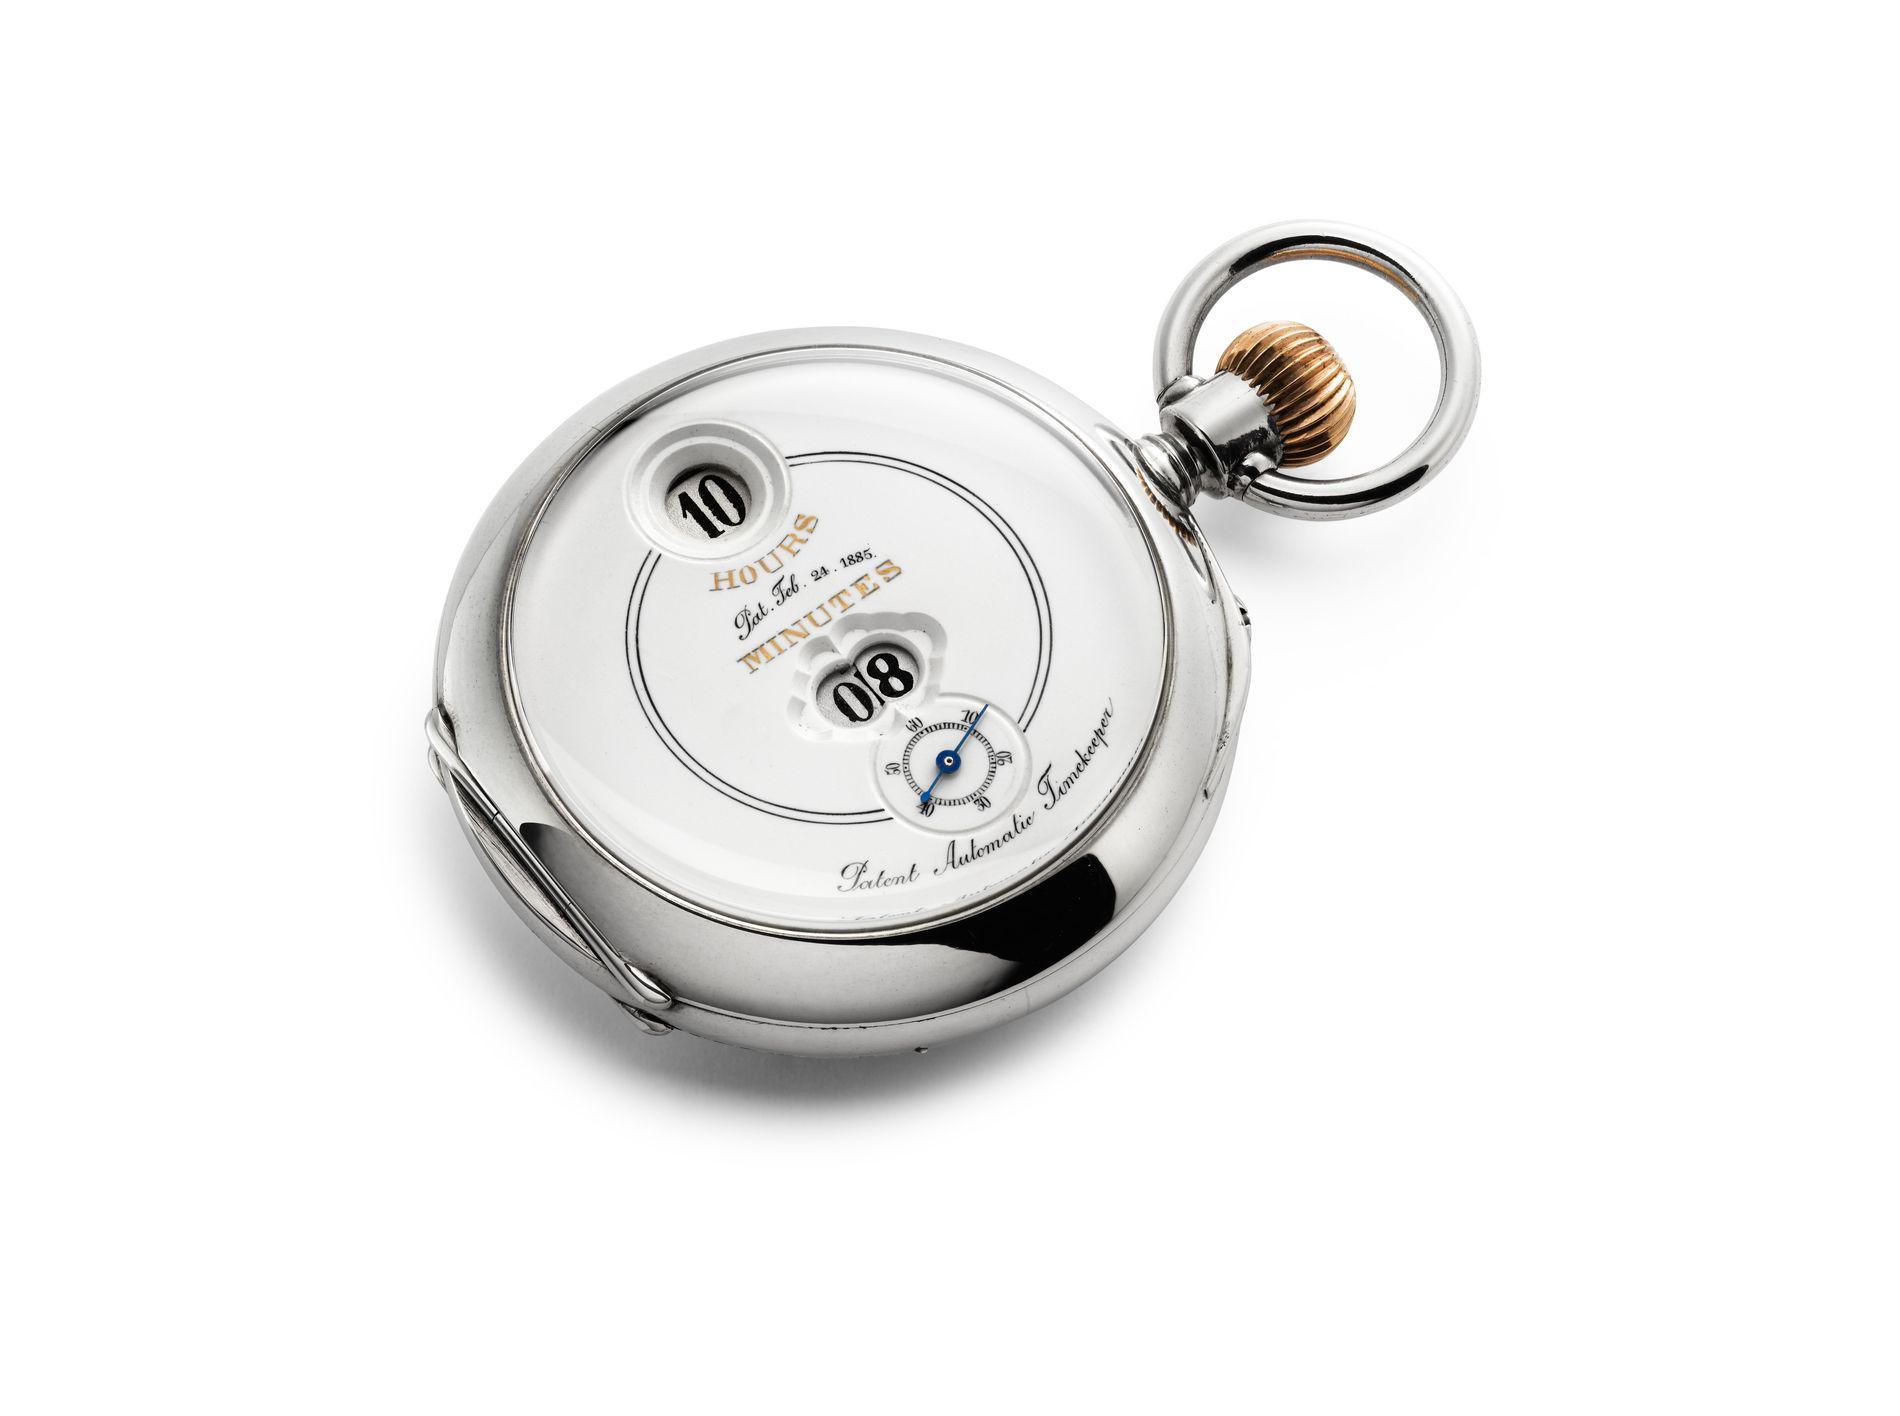 IWC Savonnette Pocket Watch Pallweber